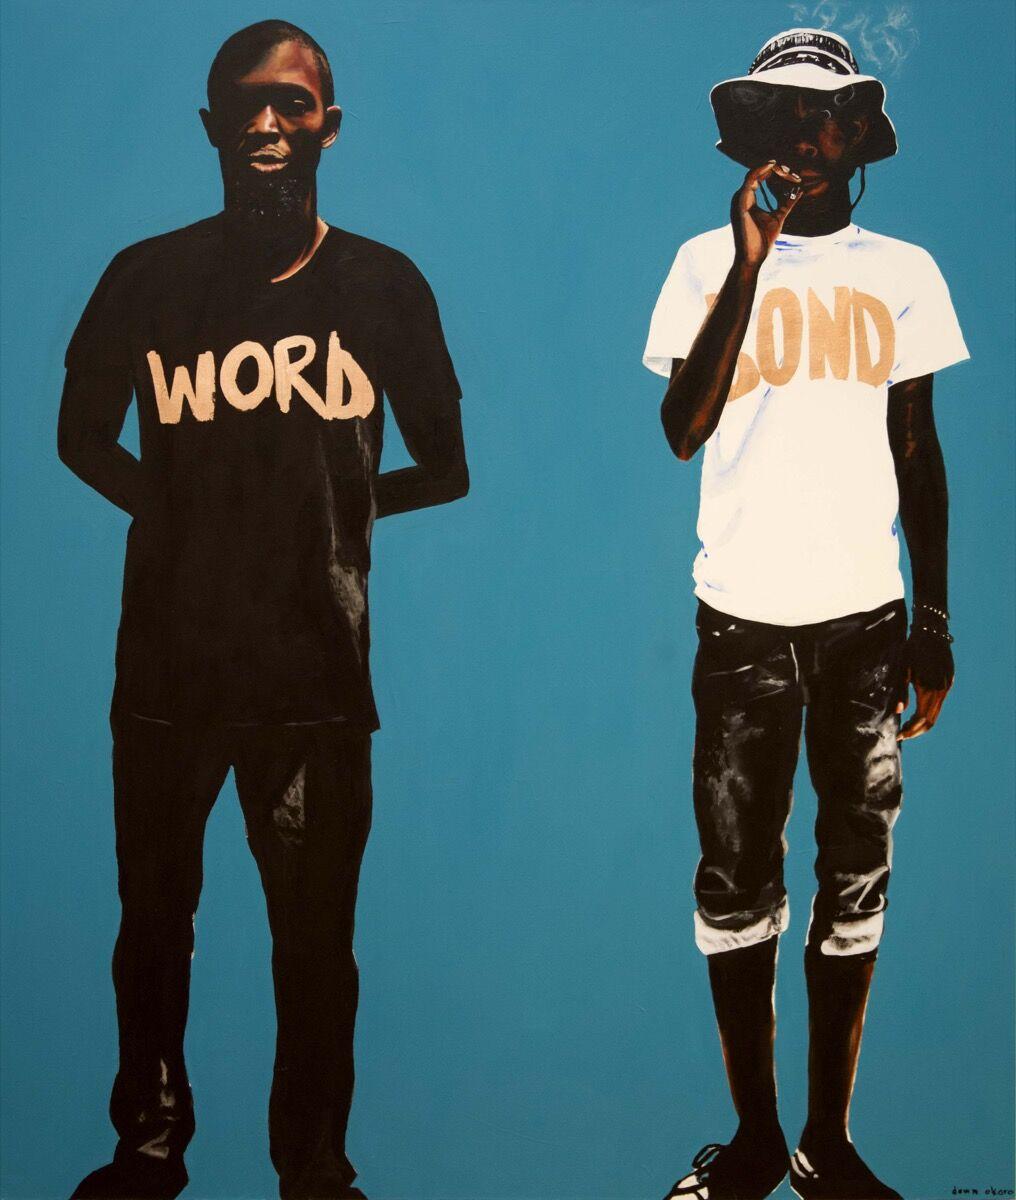 Dawn Okoro, Word is Bond, 2018. Courtesy of the artist.